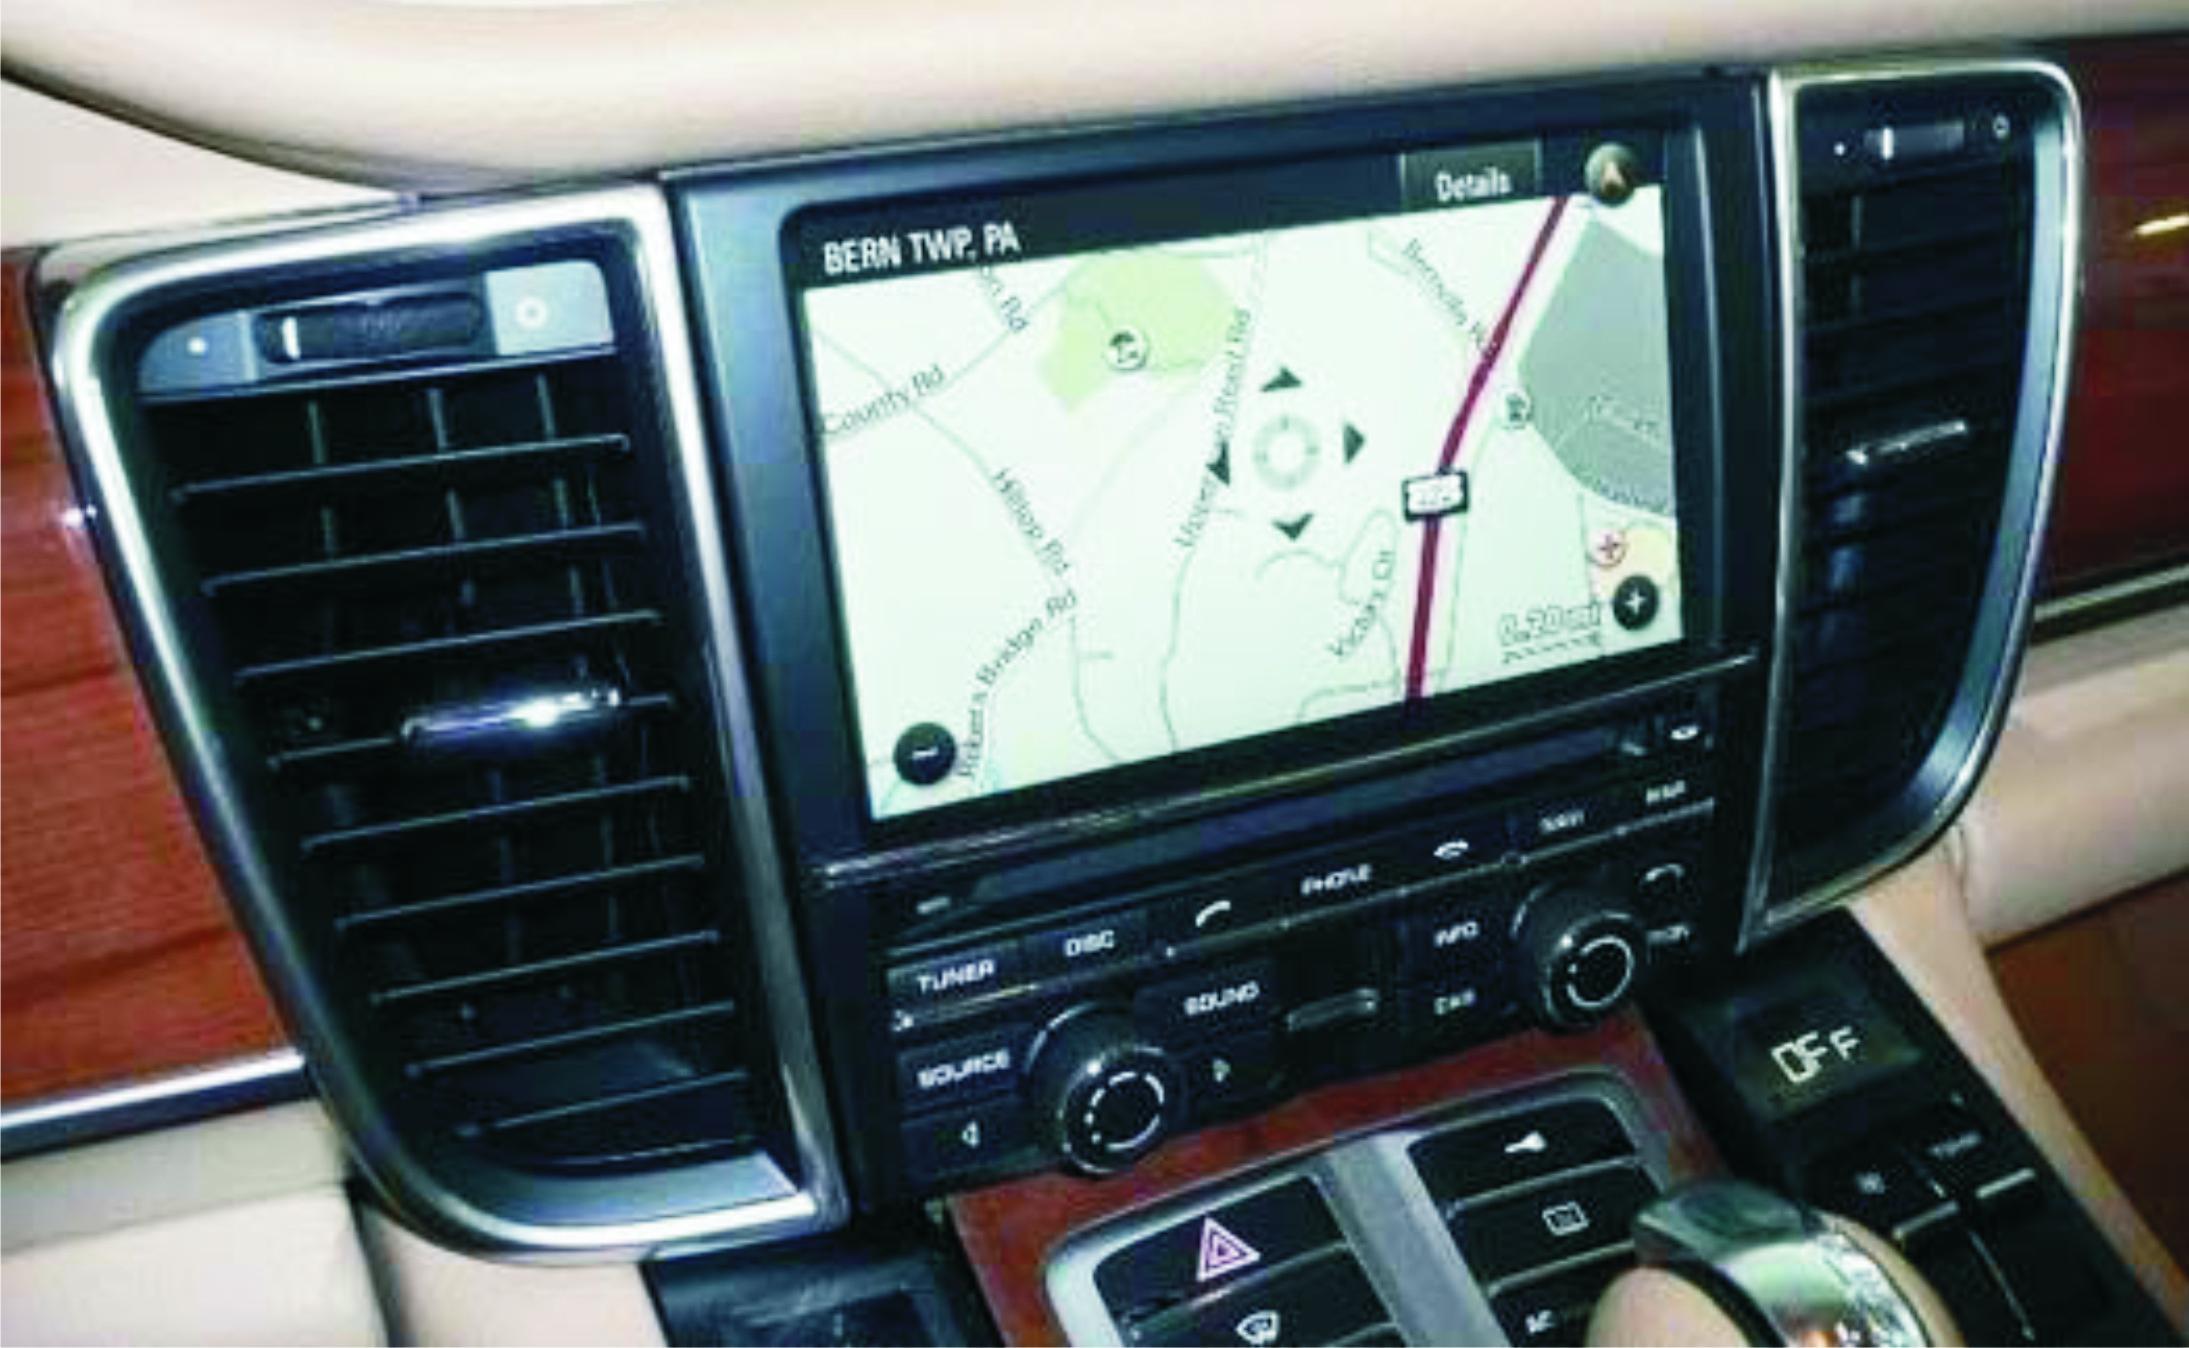 PORSCHE PCM 3 1 Reverse Camera | Vehicle Integration Products